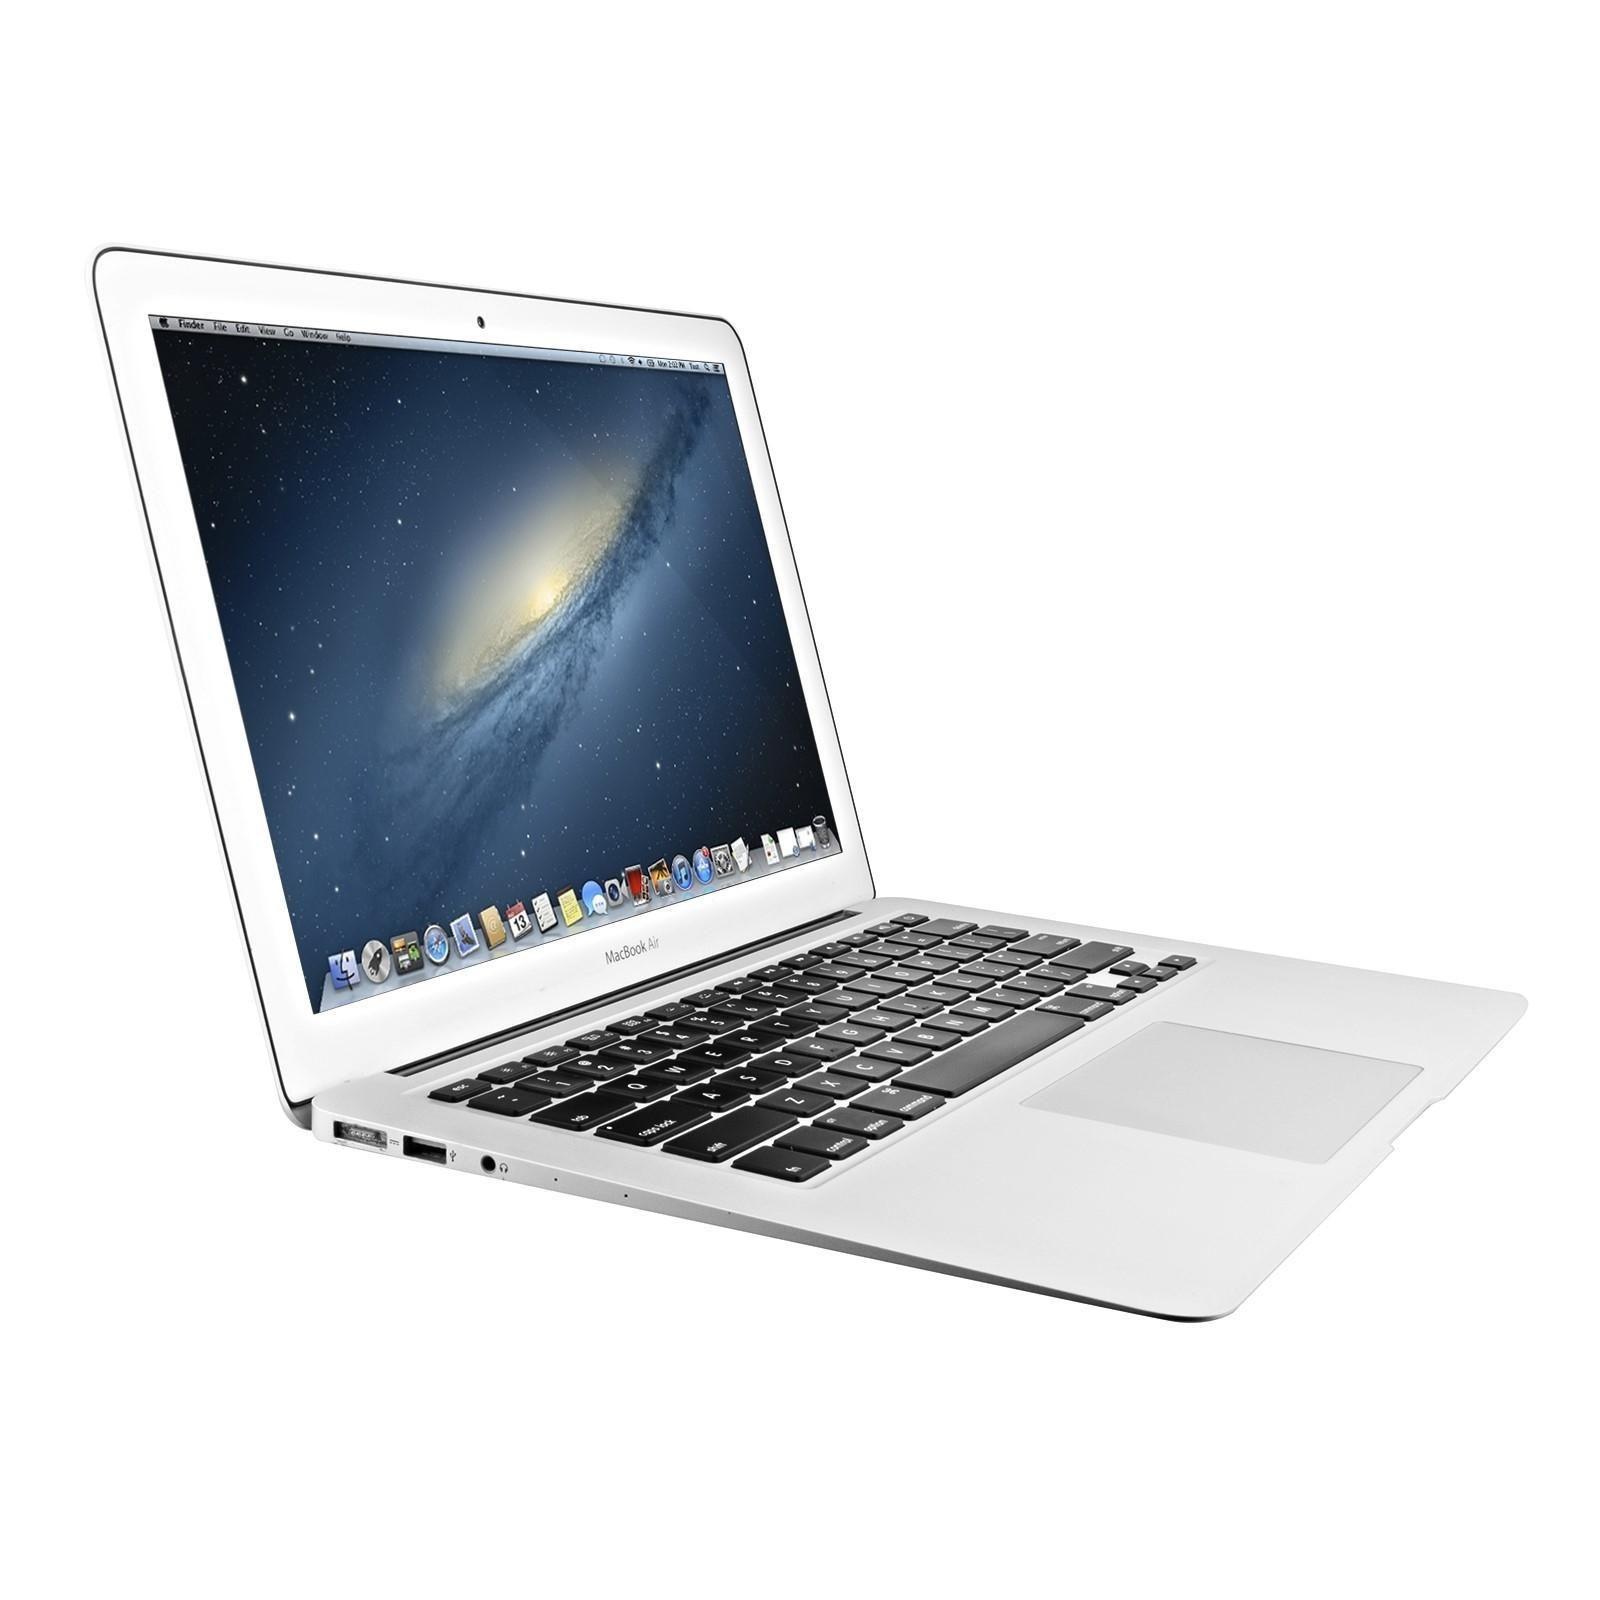 Macbook Air 13 3 Inch Mid 2013 Core I5 4gb Ssd 128 Gb Apple Macbook Apple Macbook Air Macbook Air